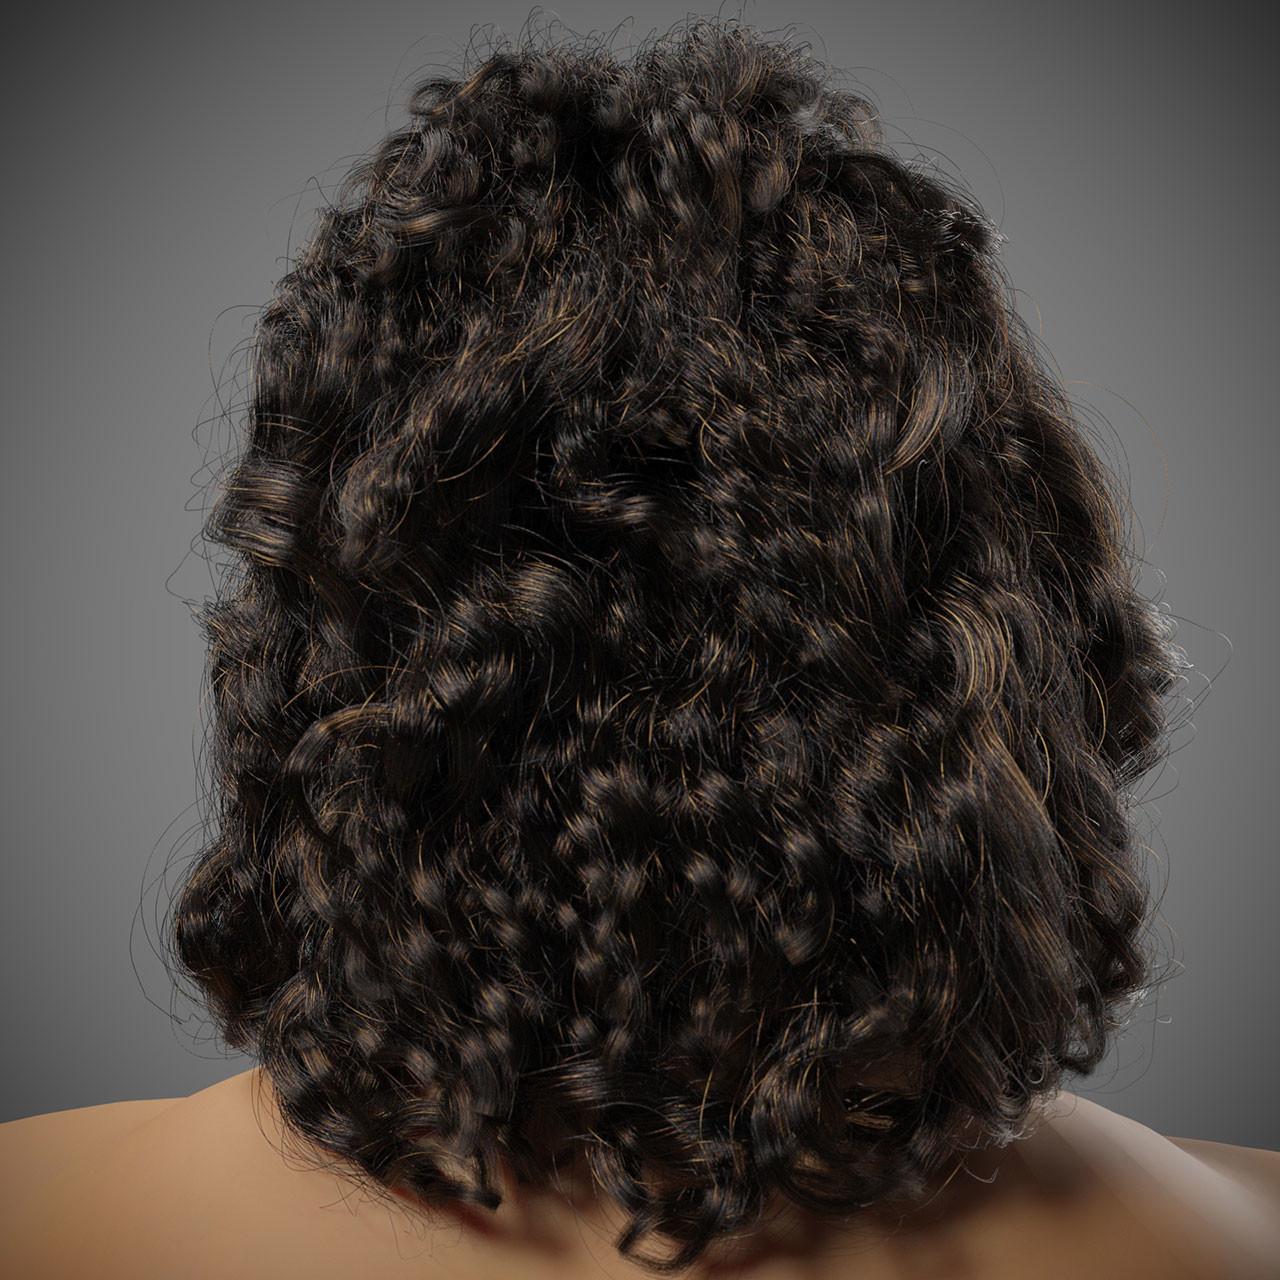 Andrew krivulya joseph hairstyle 1 r 08 by andrew krivulya